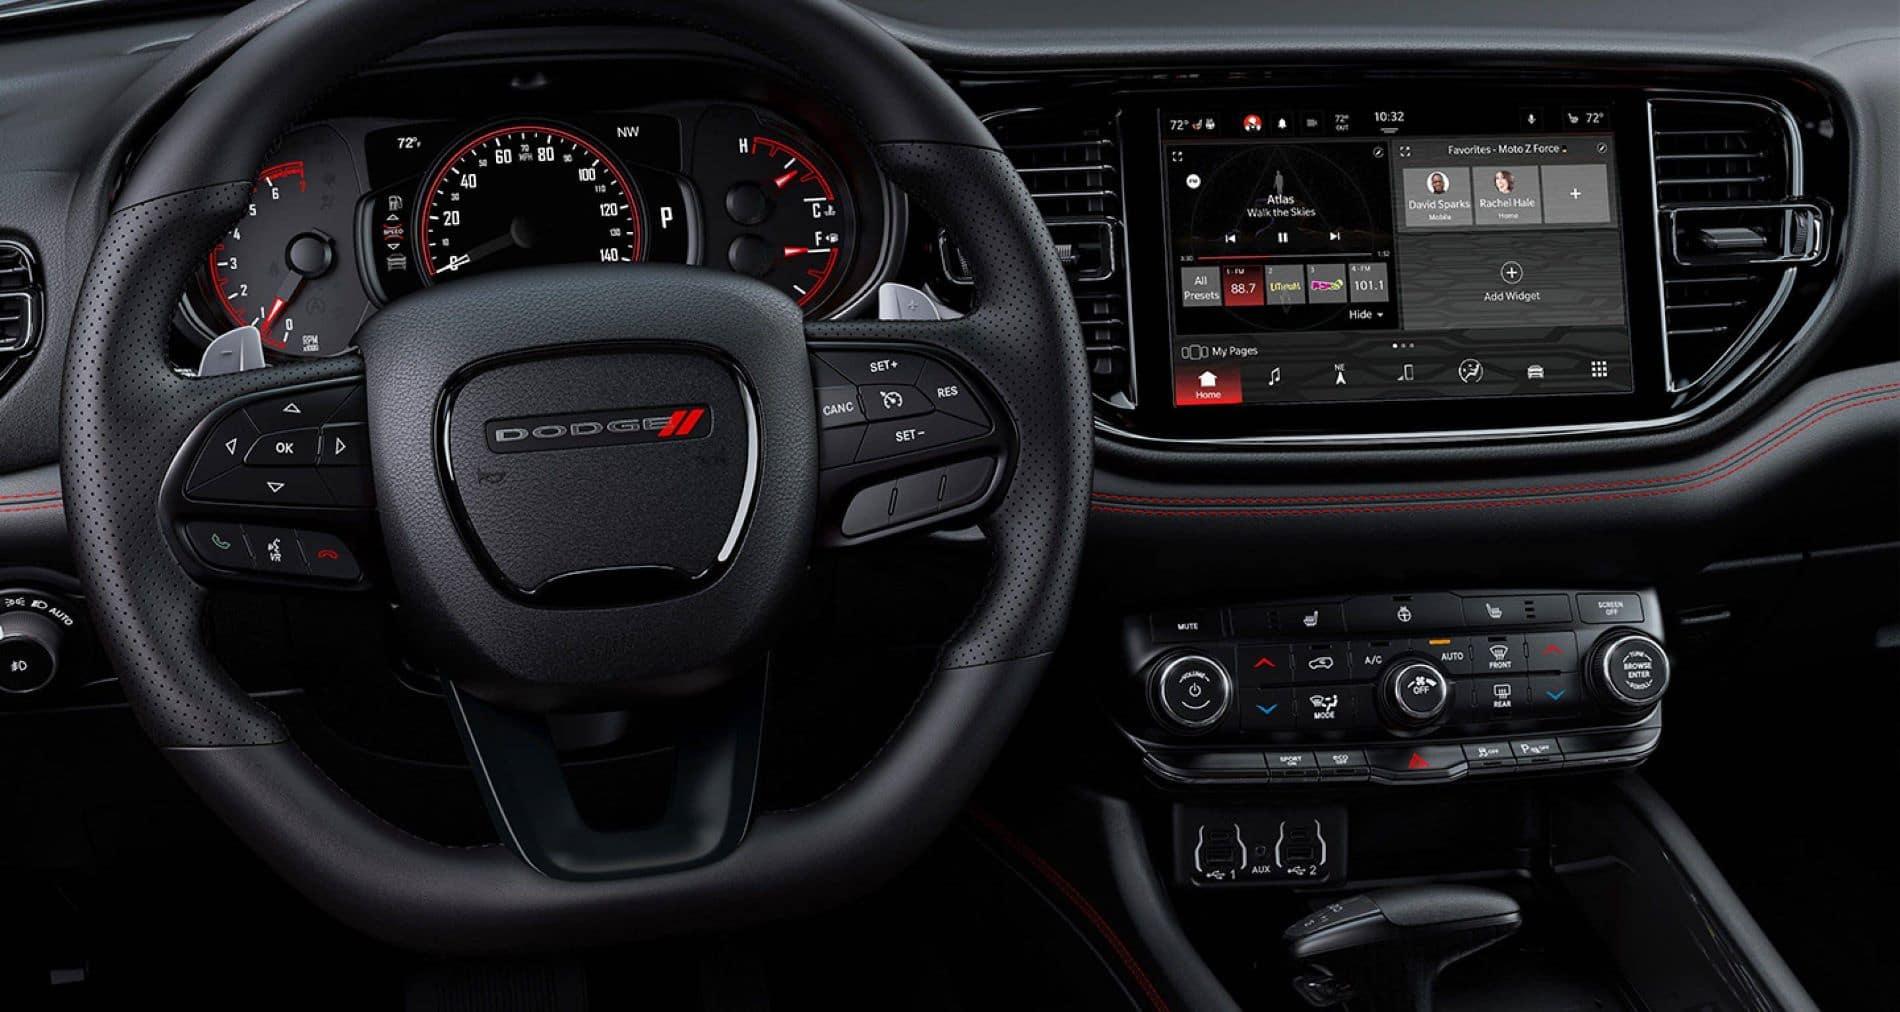 2021 Dodge Durango Technology